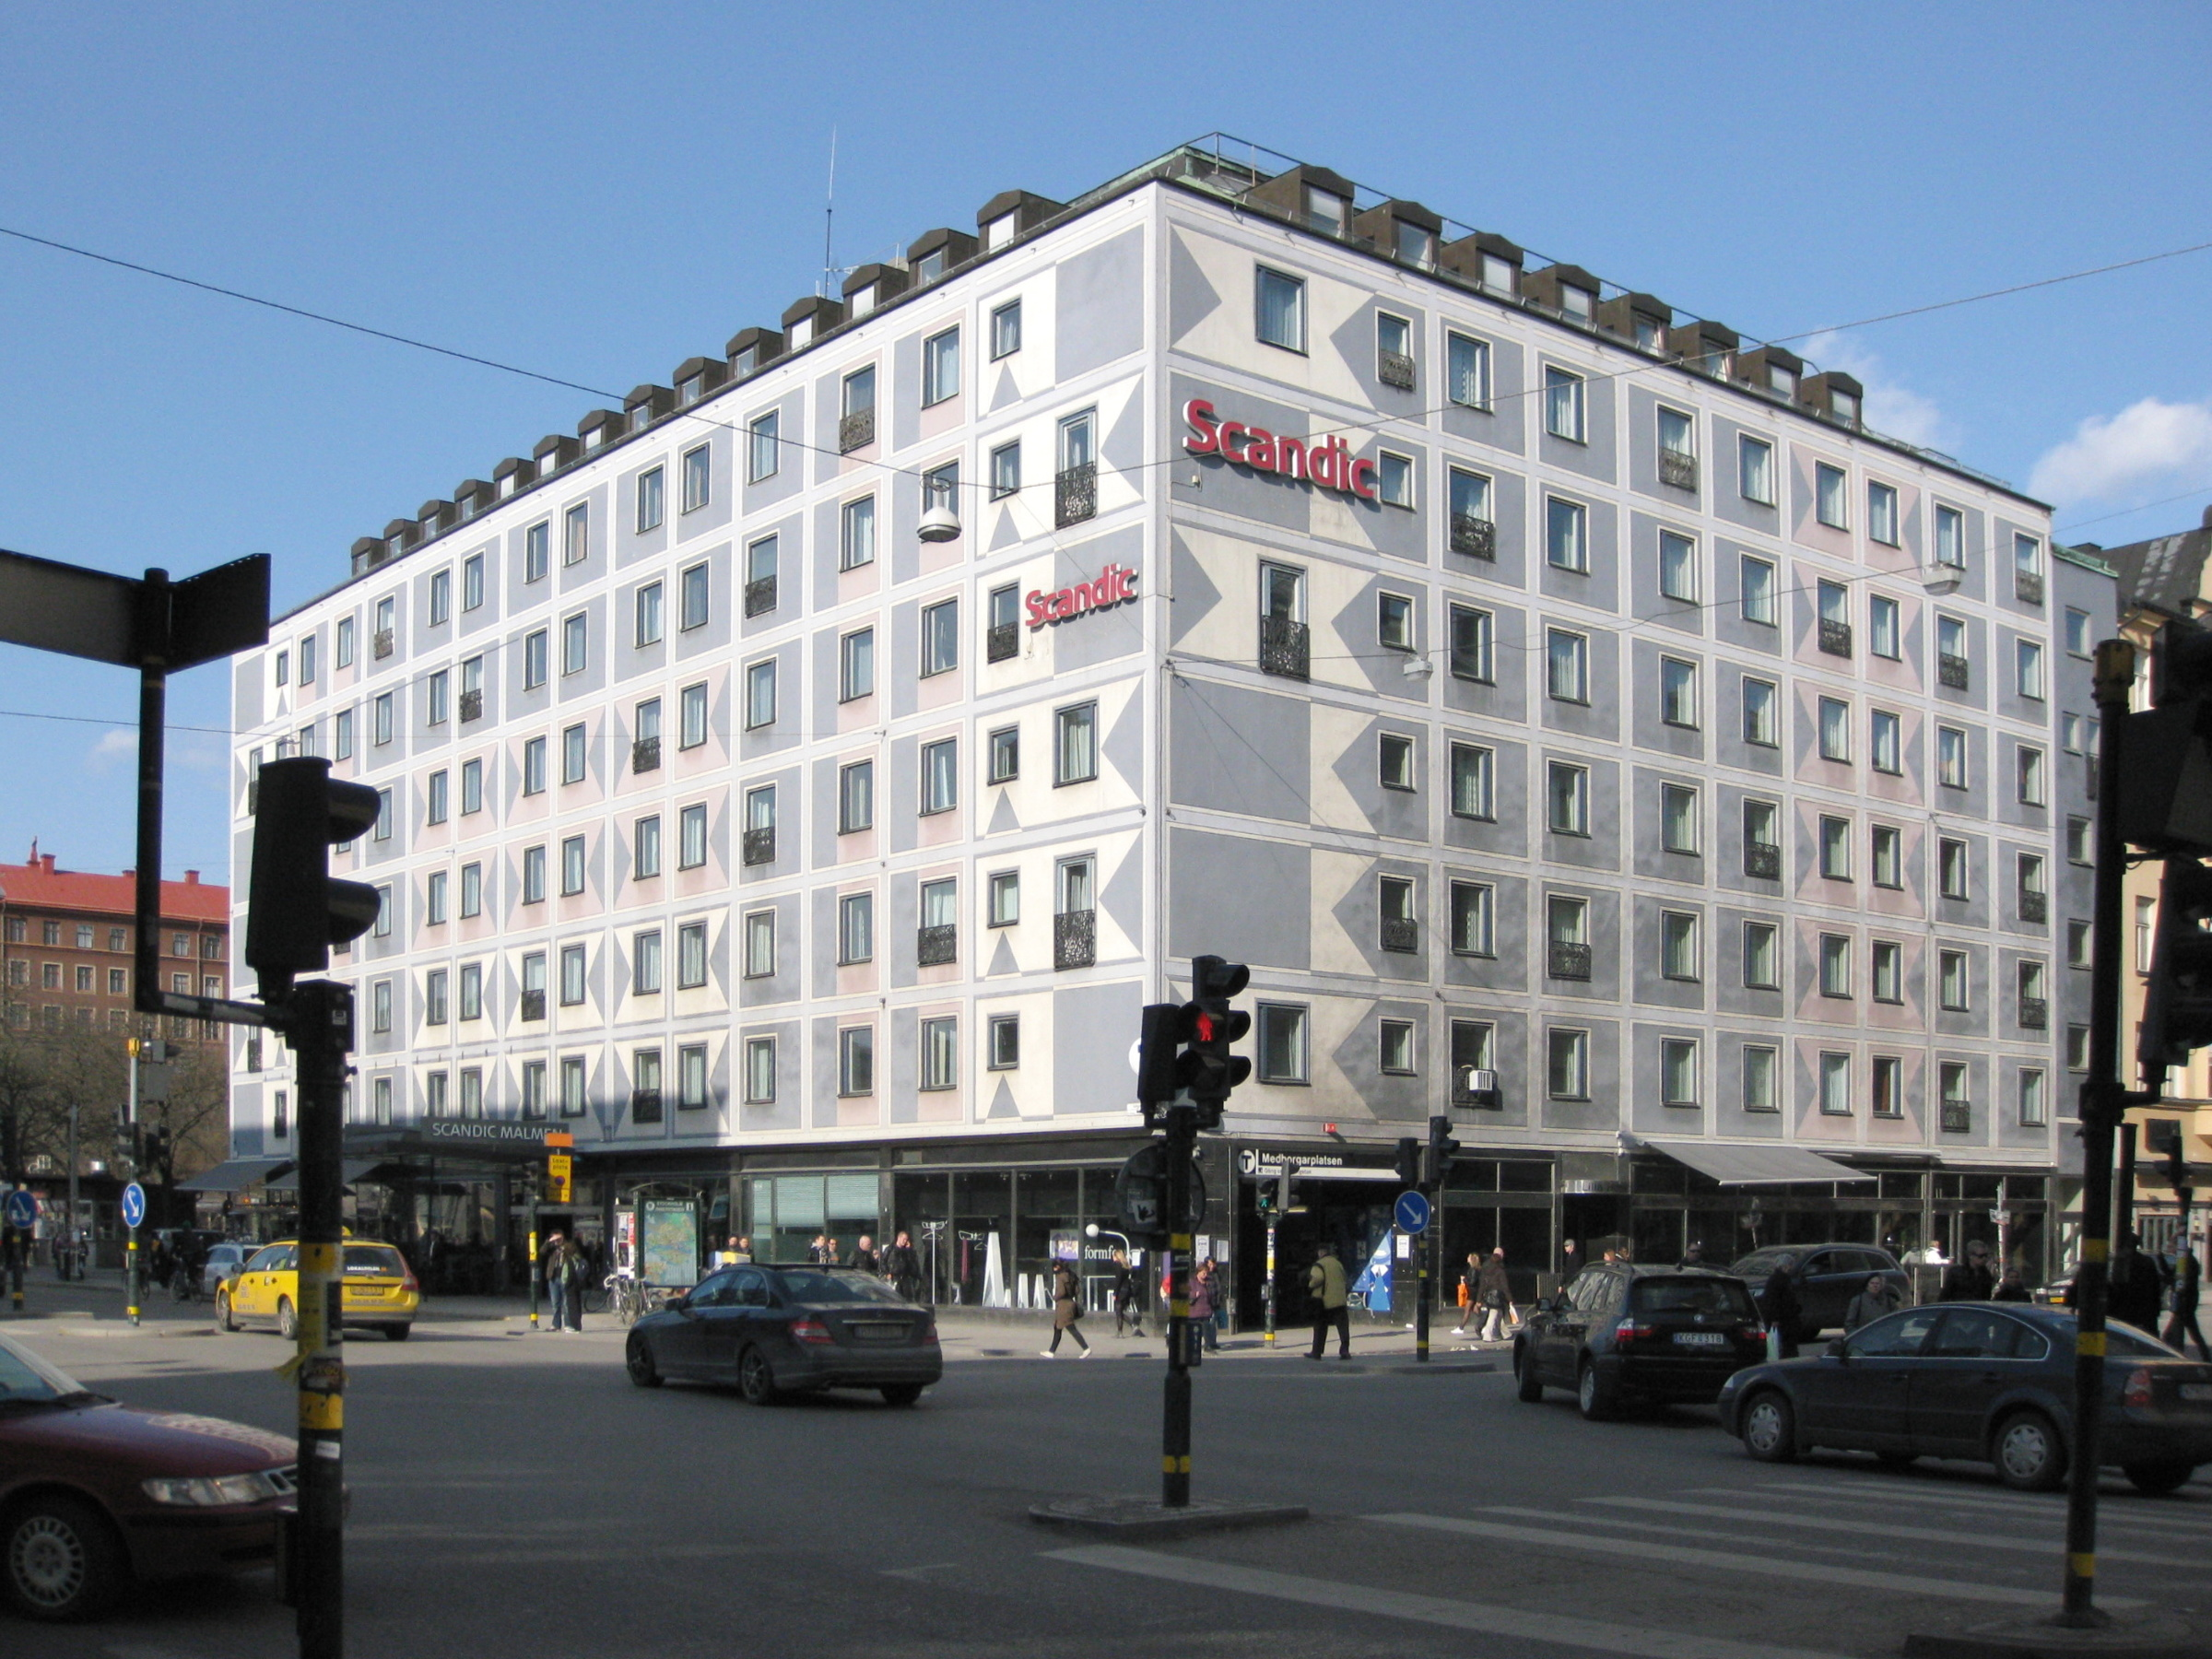 hotell stockholm östermalm